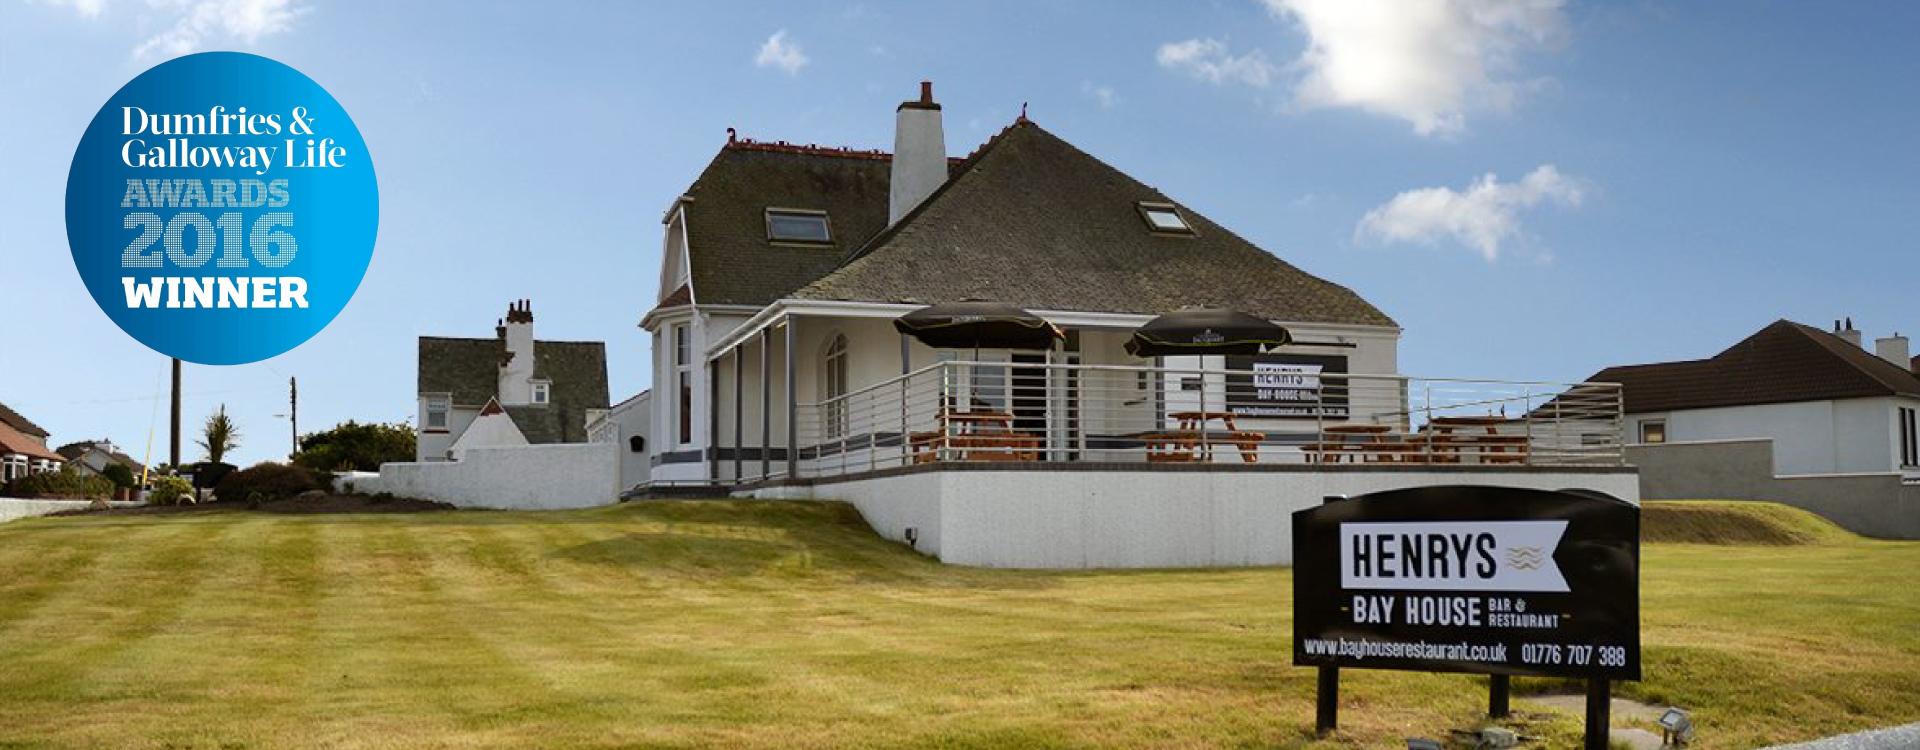 henrys bay house.jpg